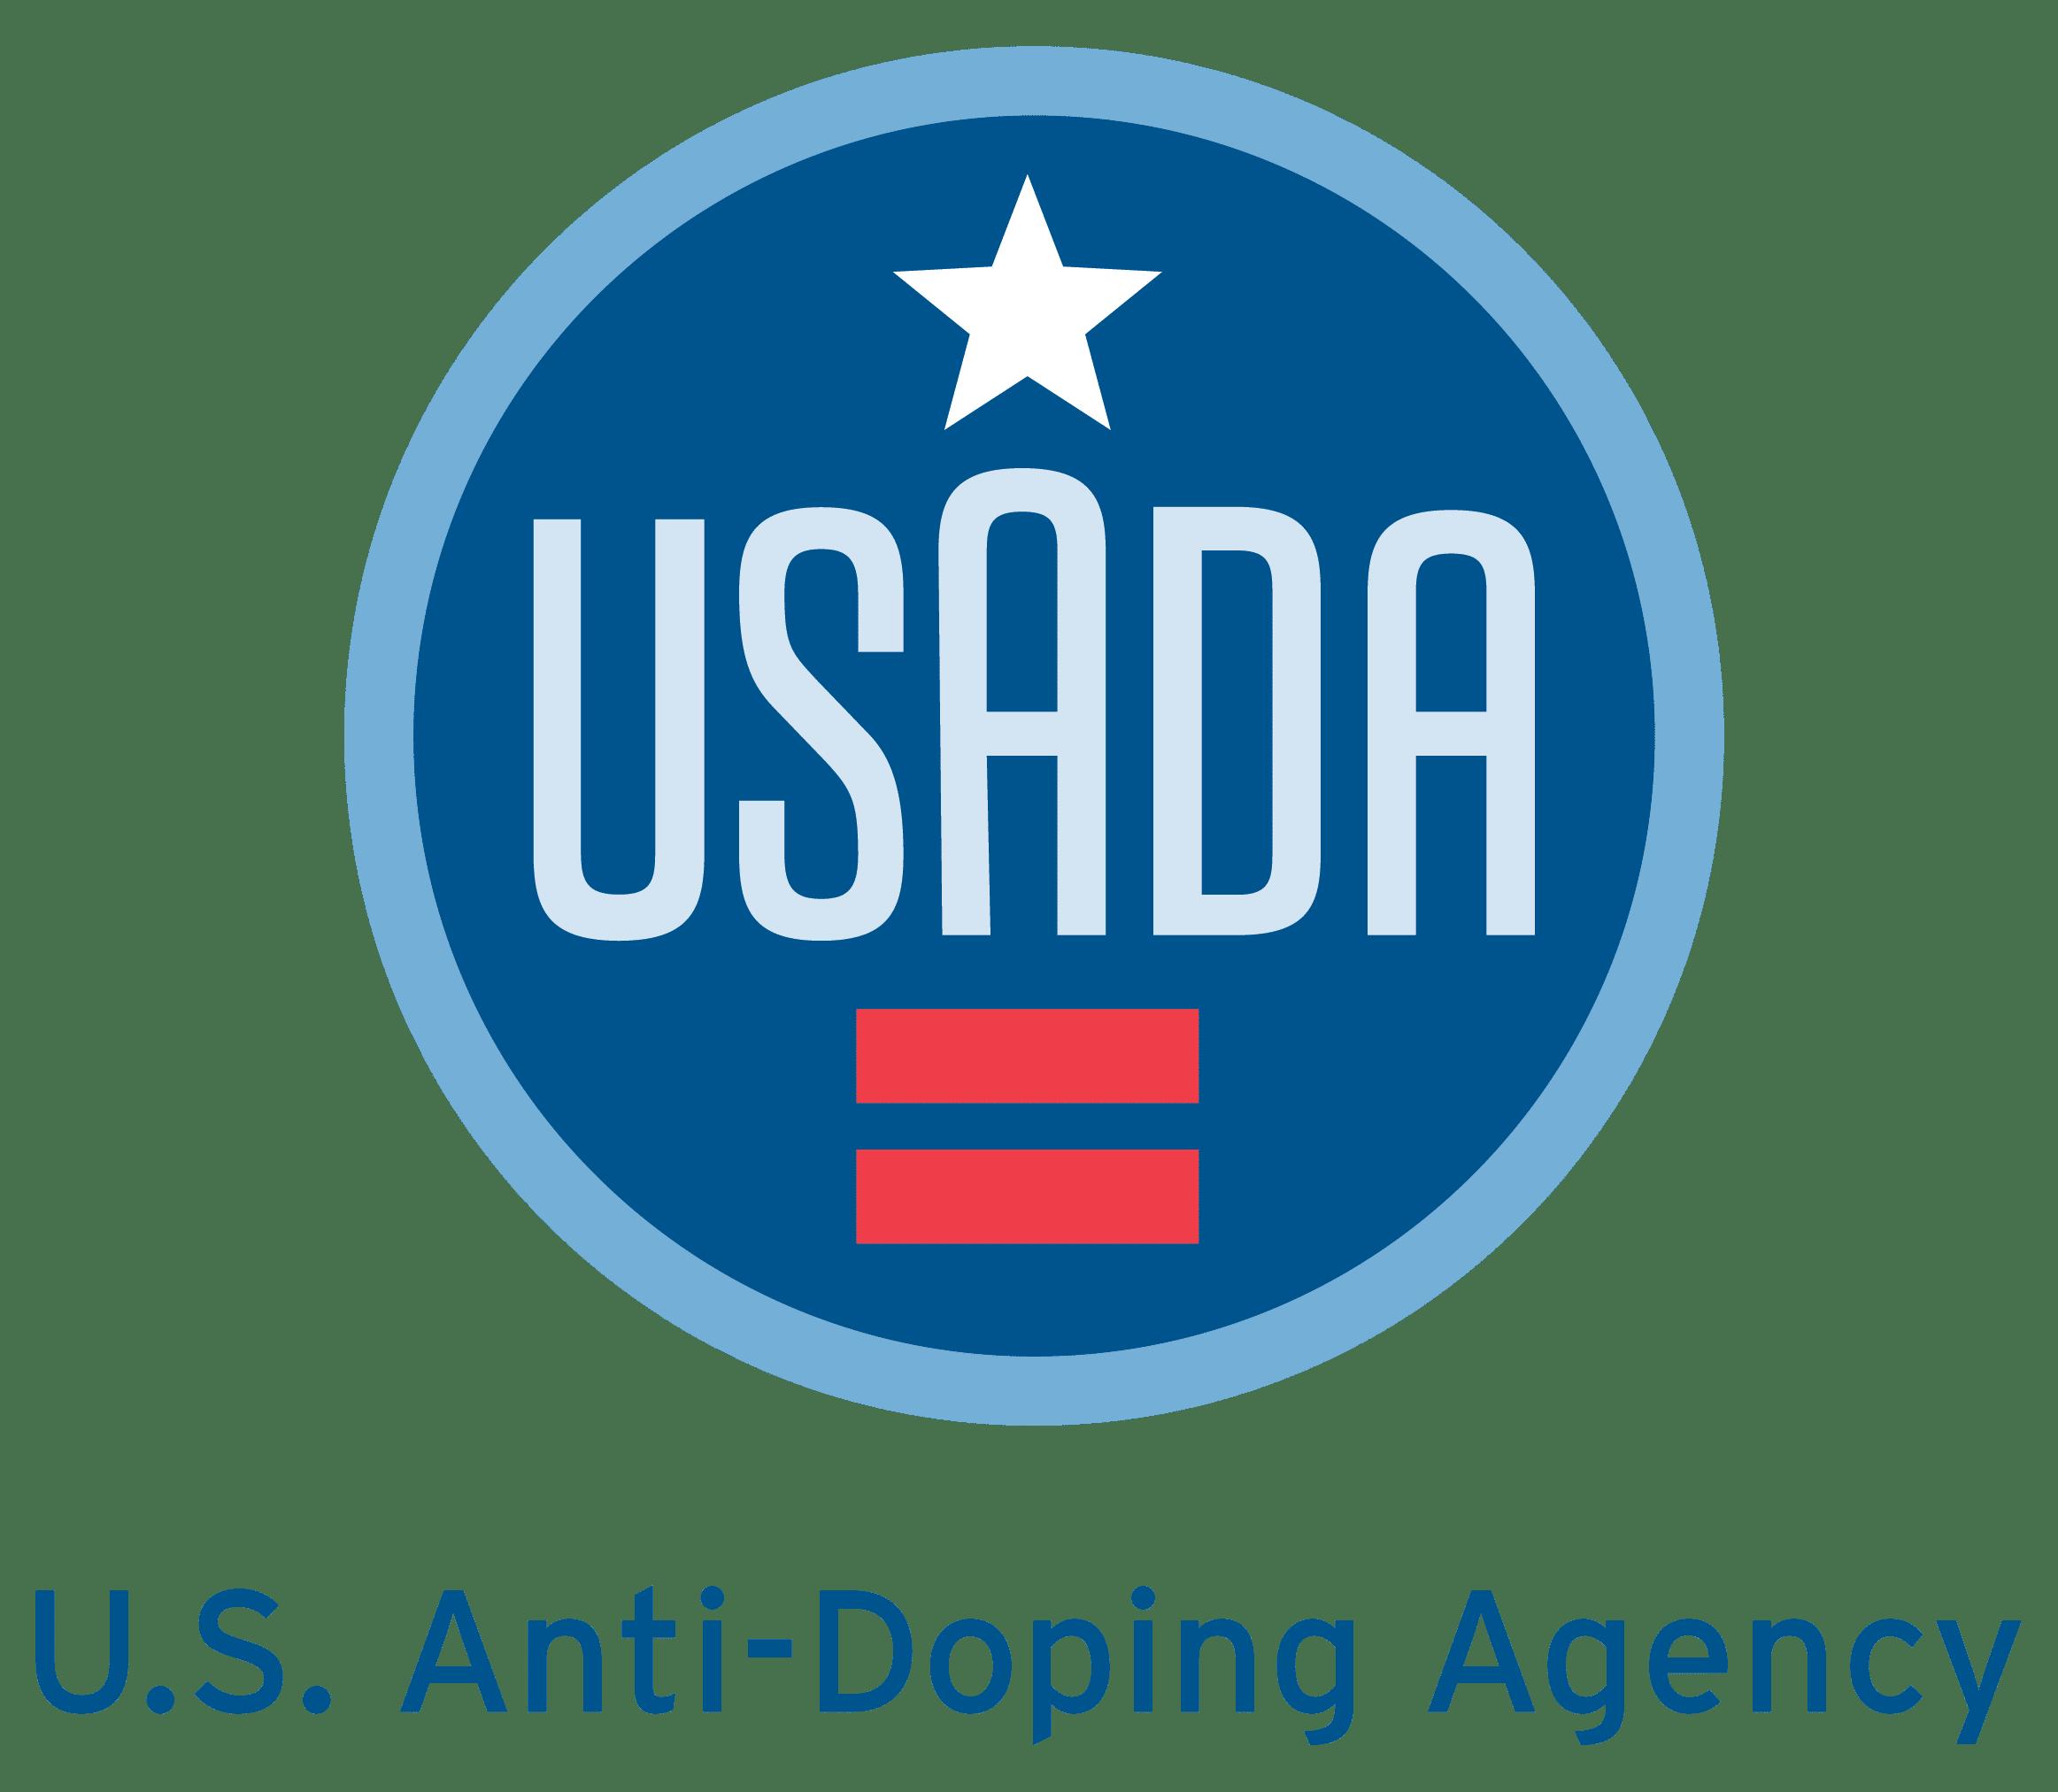 The U.S. Anti-Doping Agency logo.